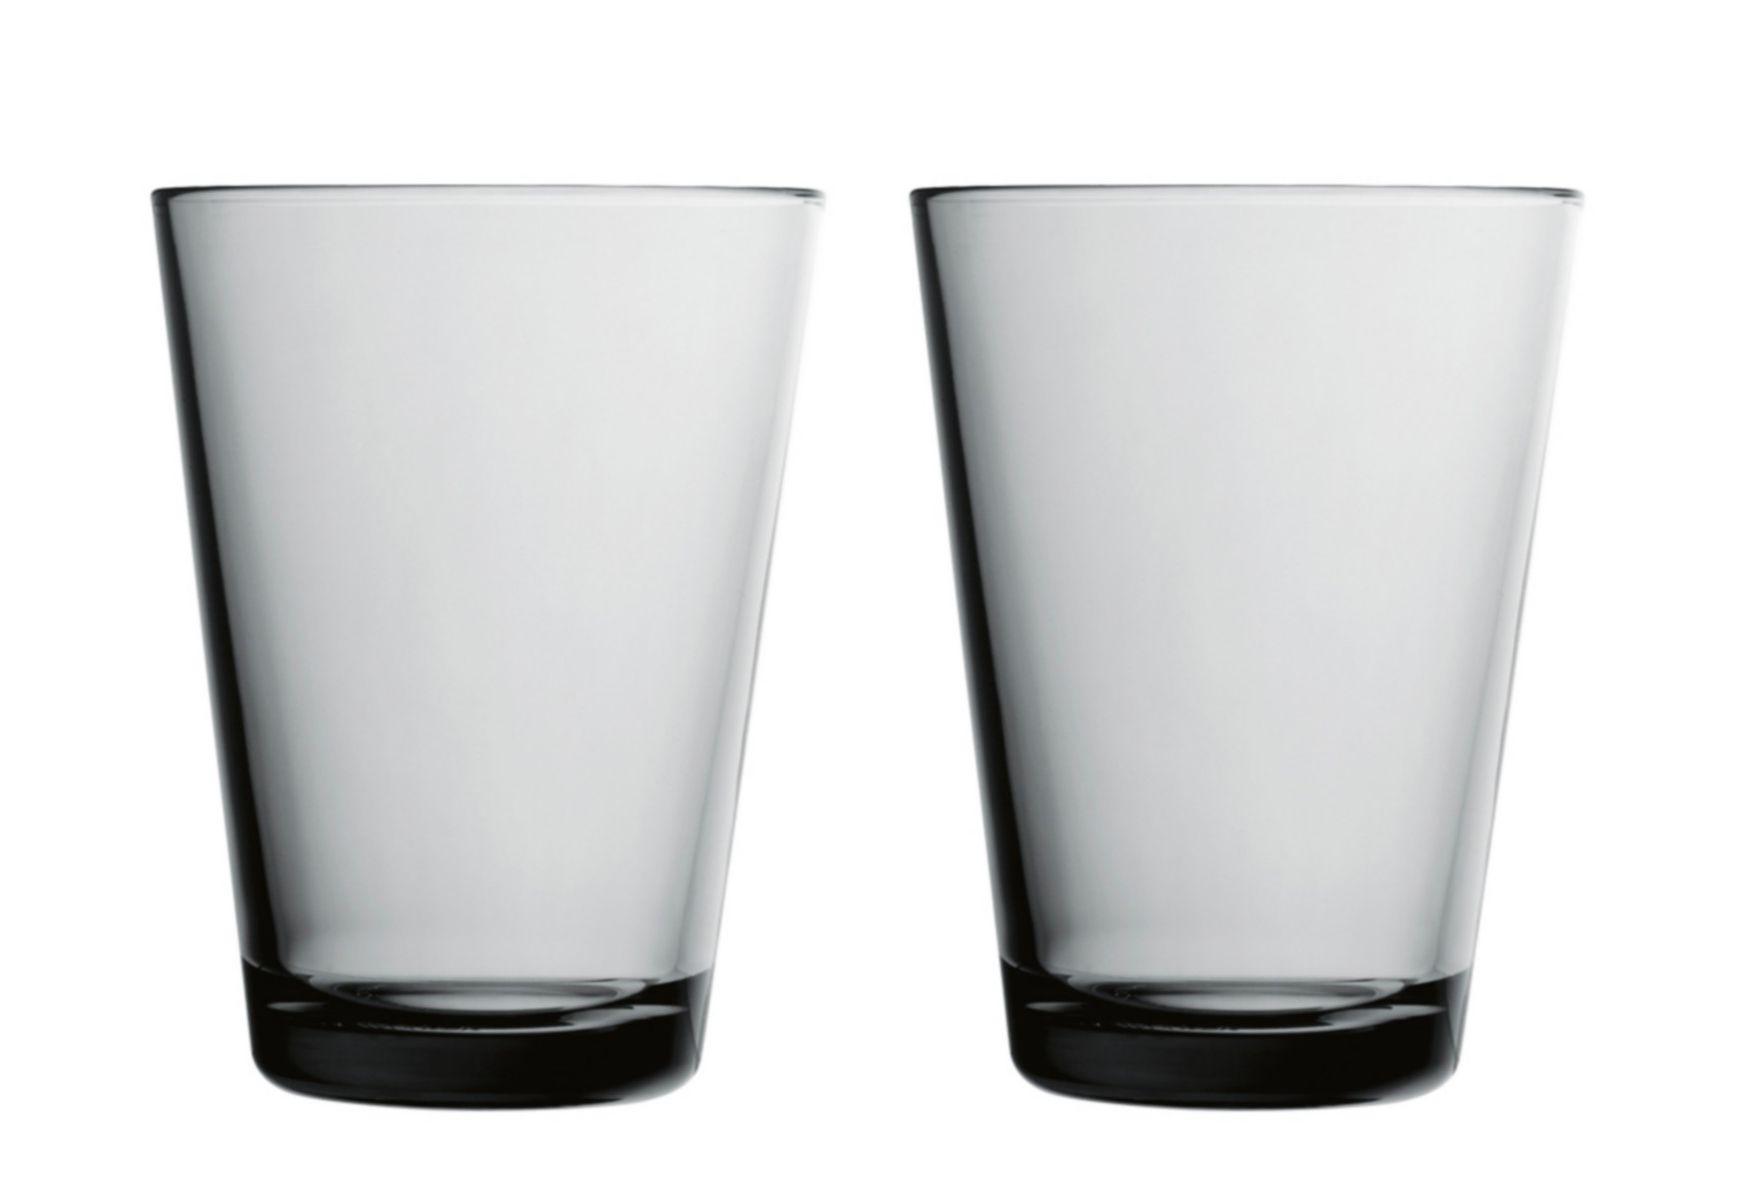 Iittala Kartio glas 40cl grijs - 2 stuks